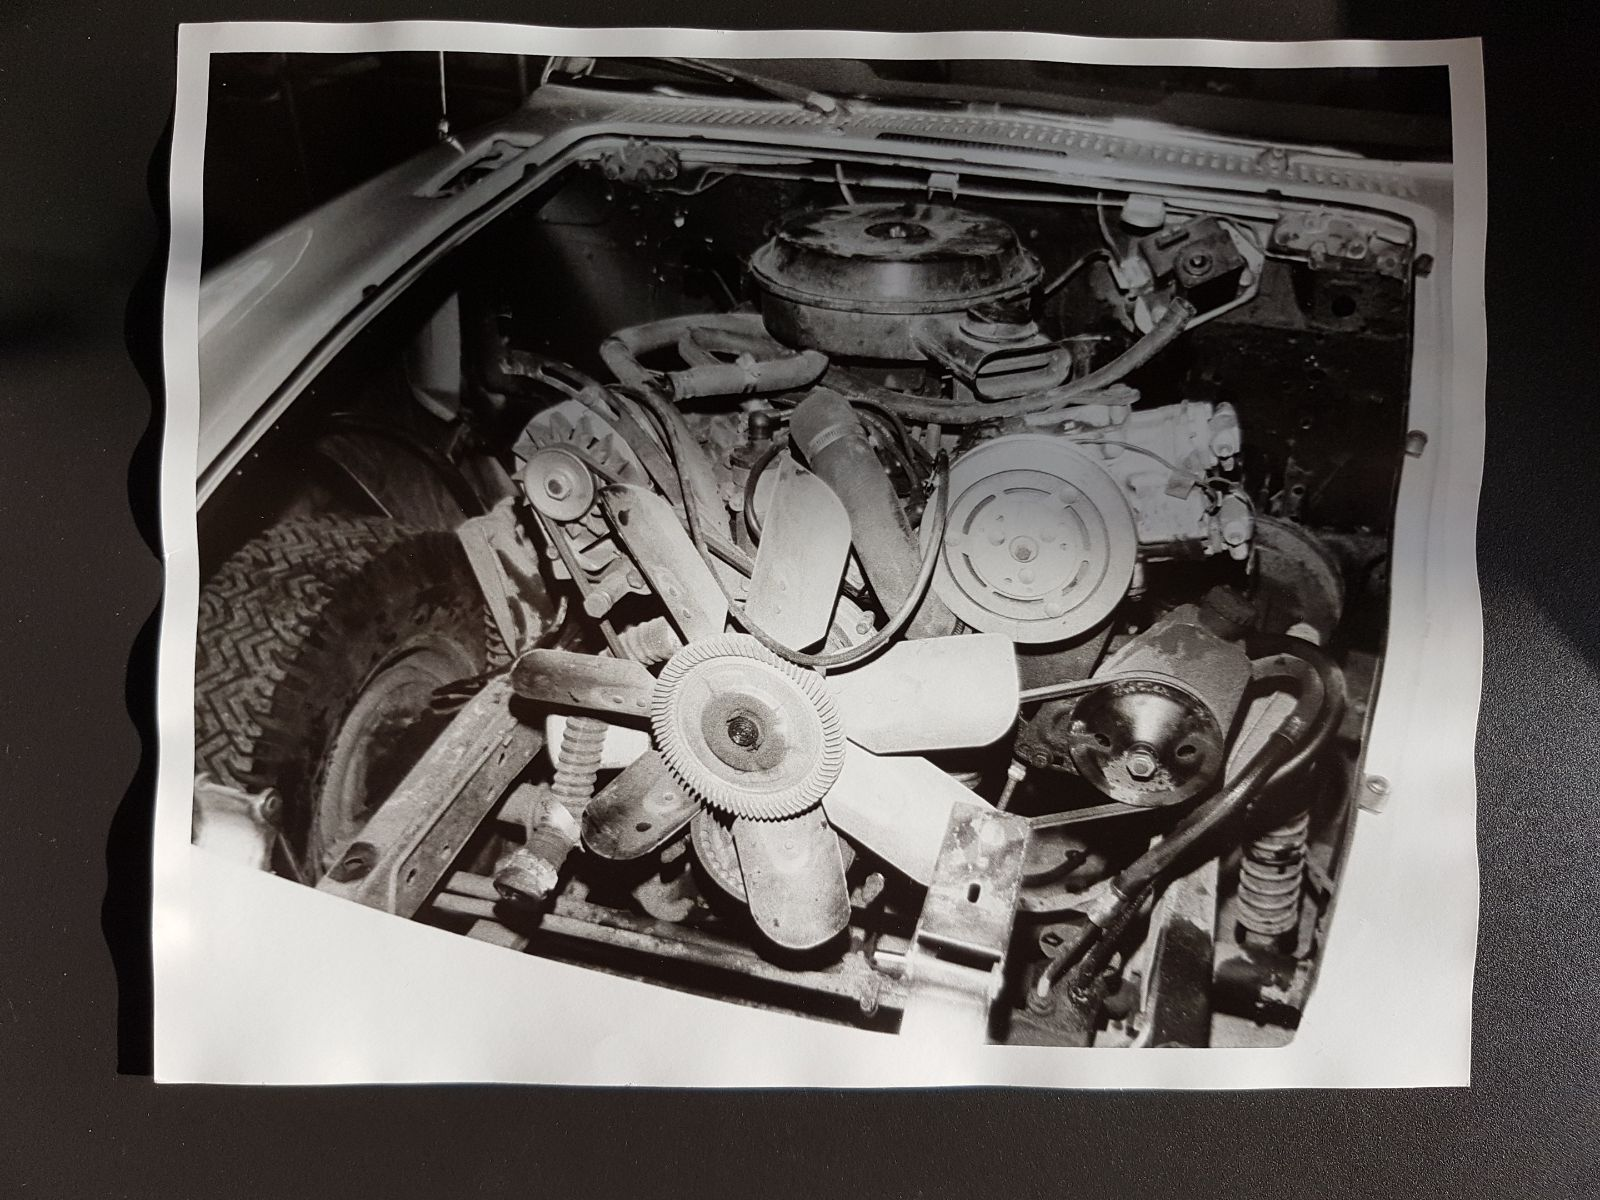 jerrari jeep motor ferrari 8